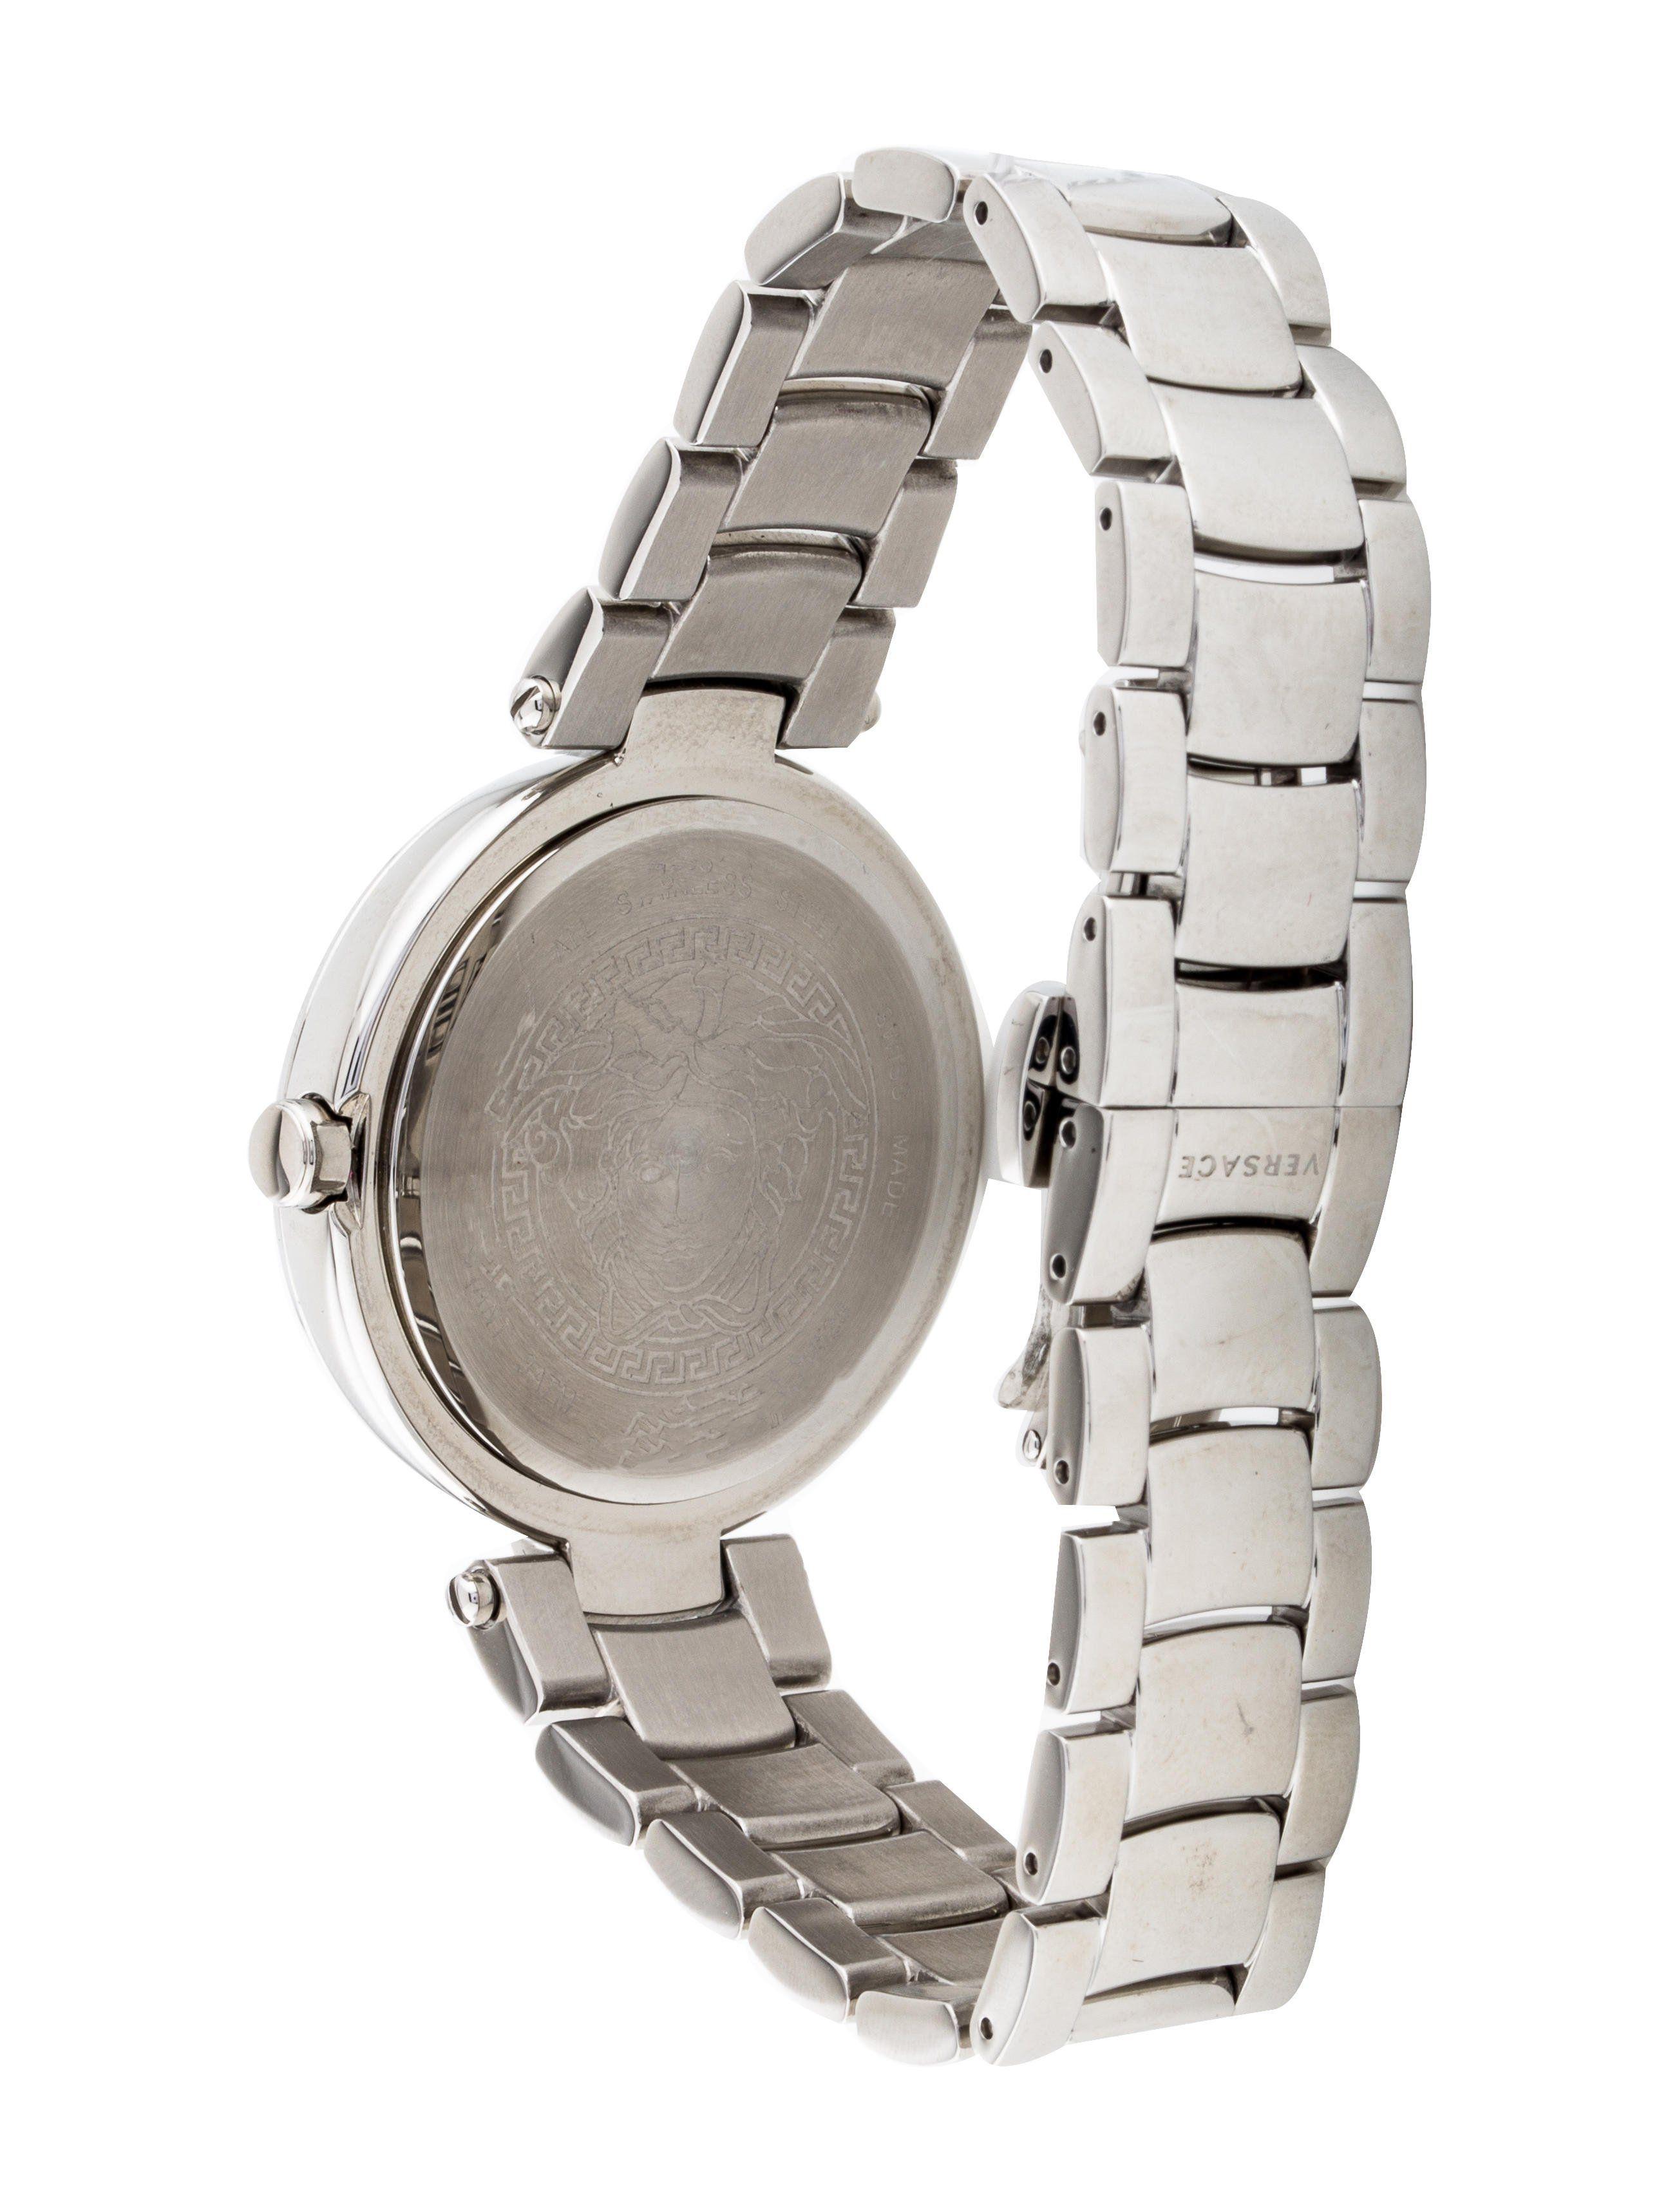 Versace mystique watch versace bracelets and diamond